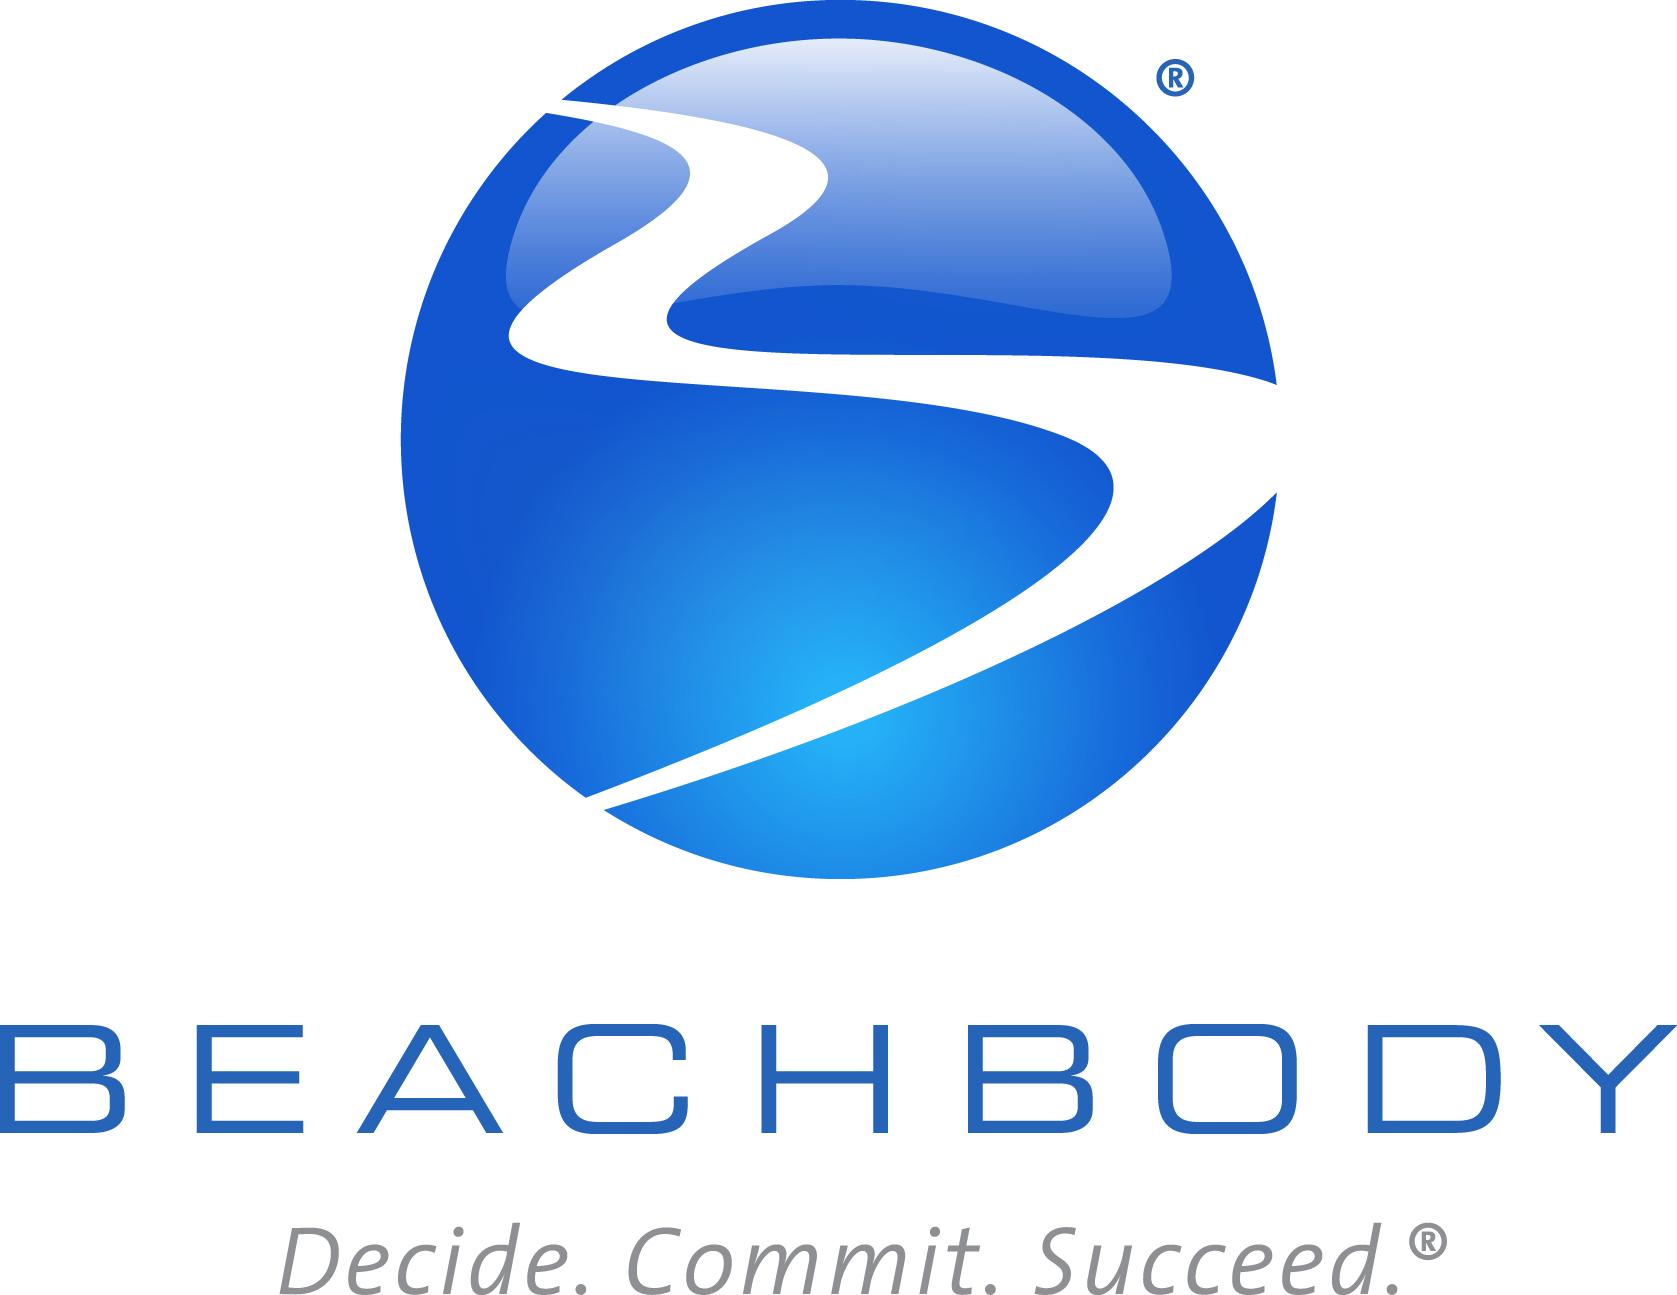 team beach body.jpg